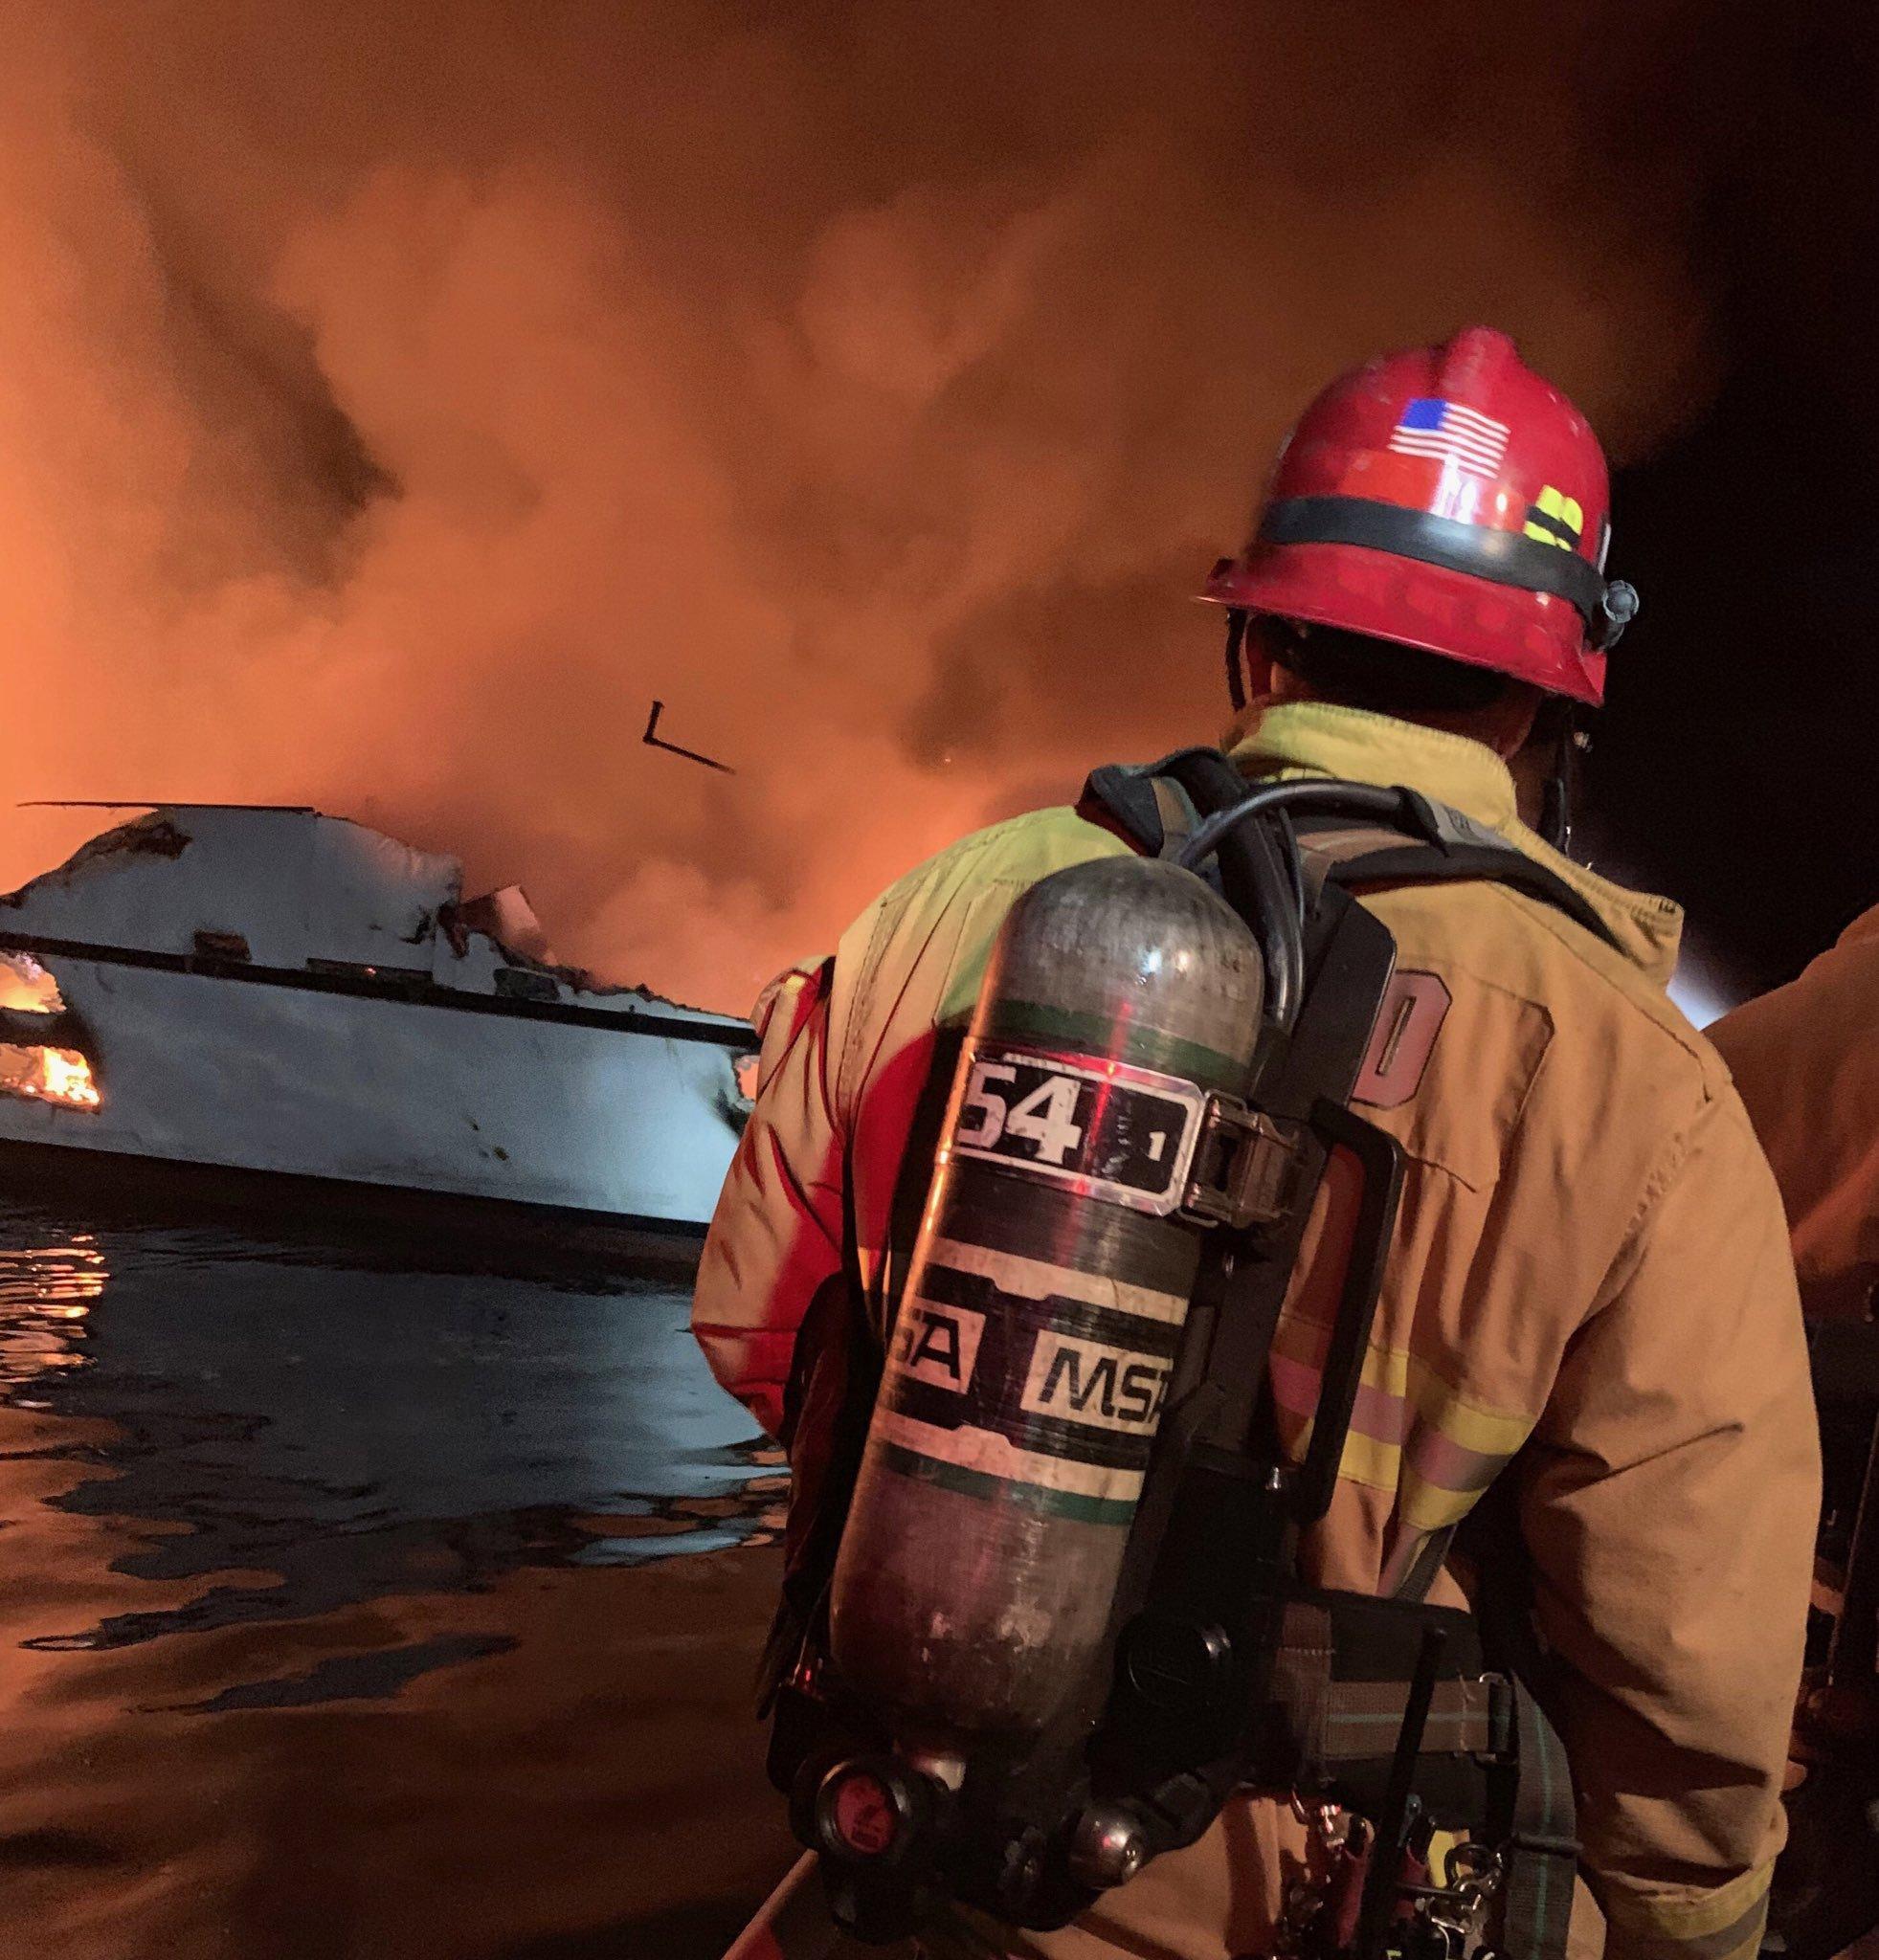 Barco con 38 personas a bordo se hunde consumido por el fuego en California